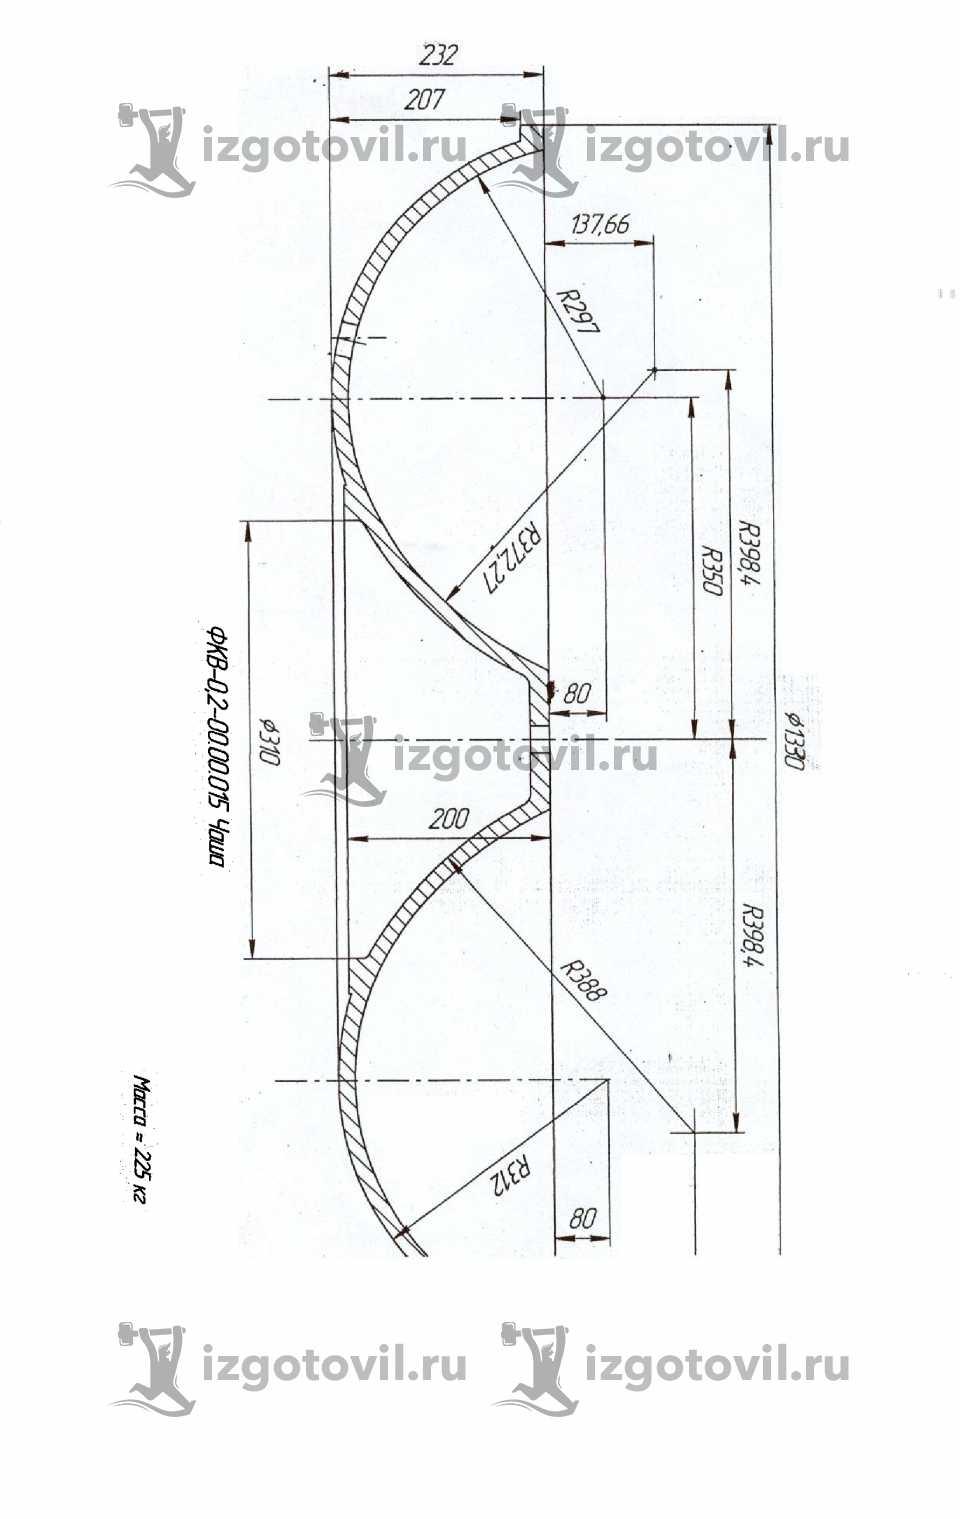 Литейное производство - Чаша